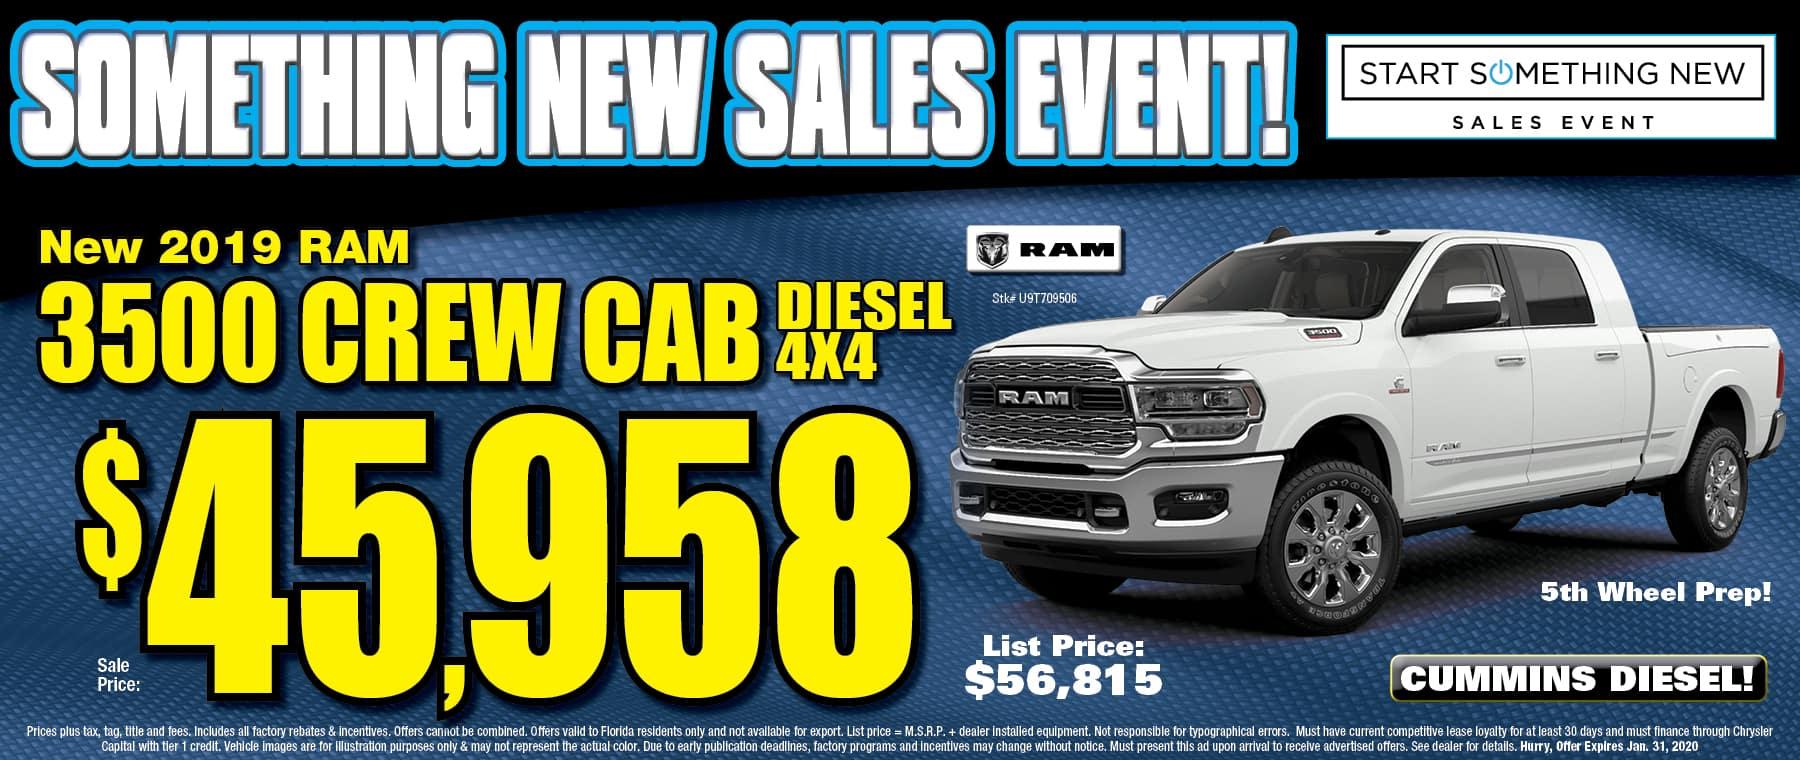 New Ram Crew Cab Diesels!